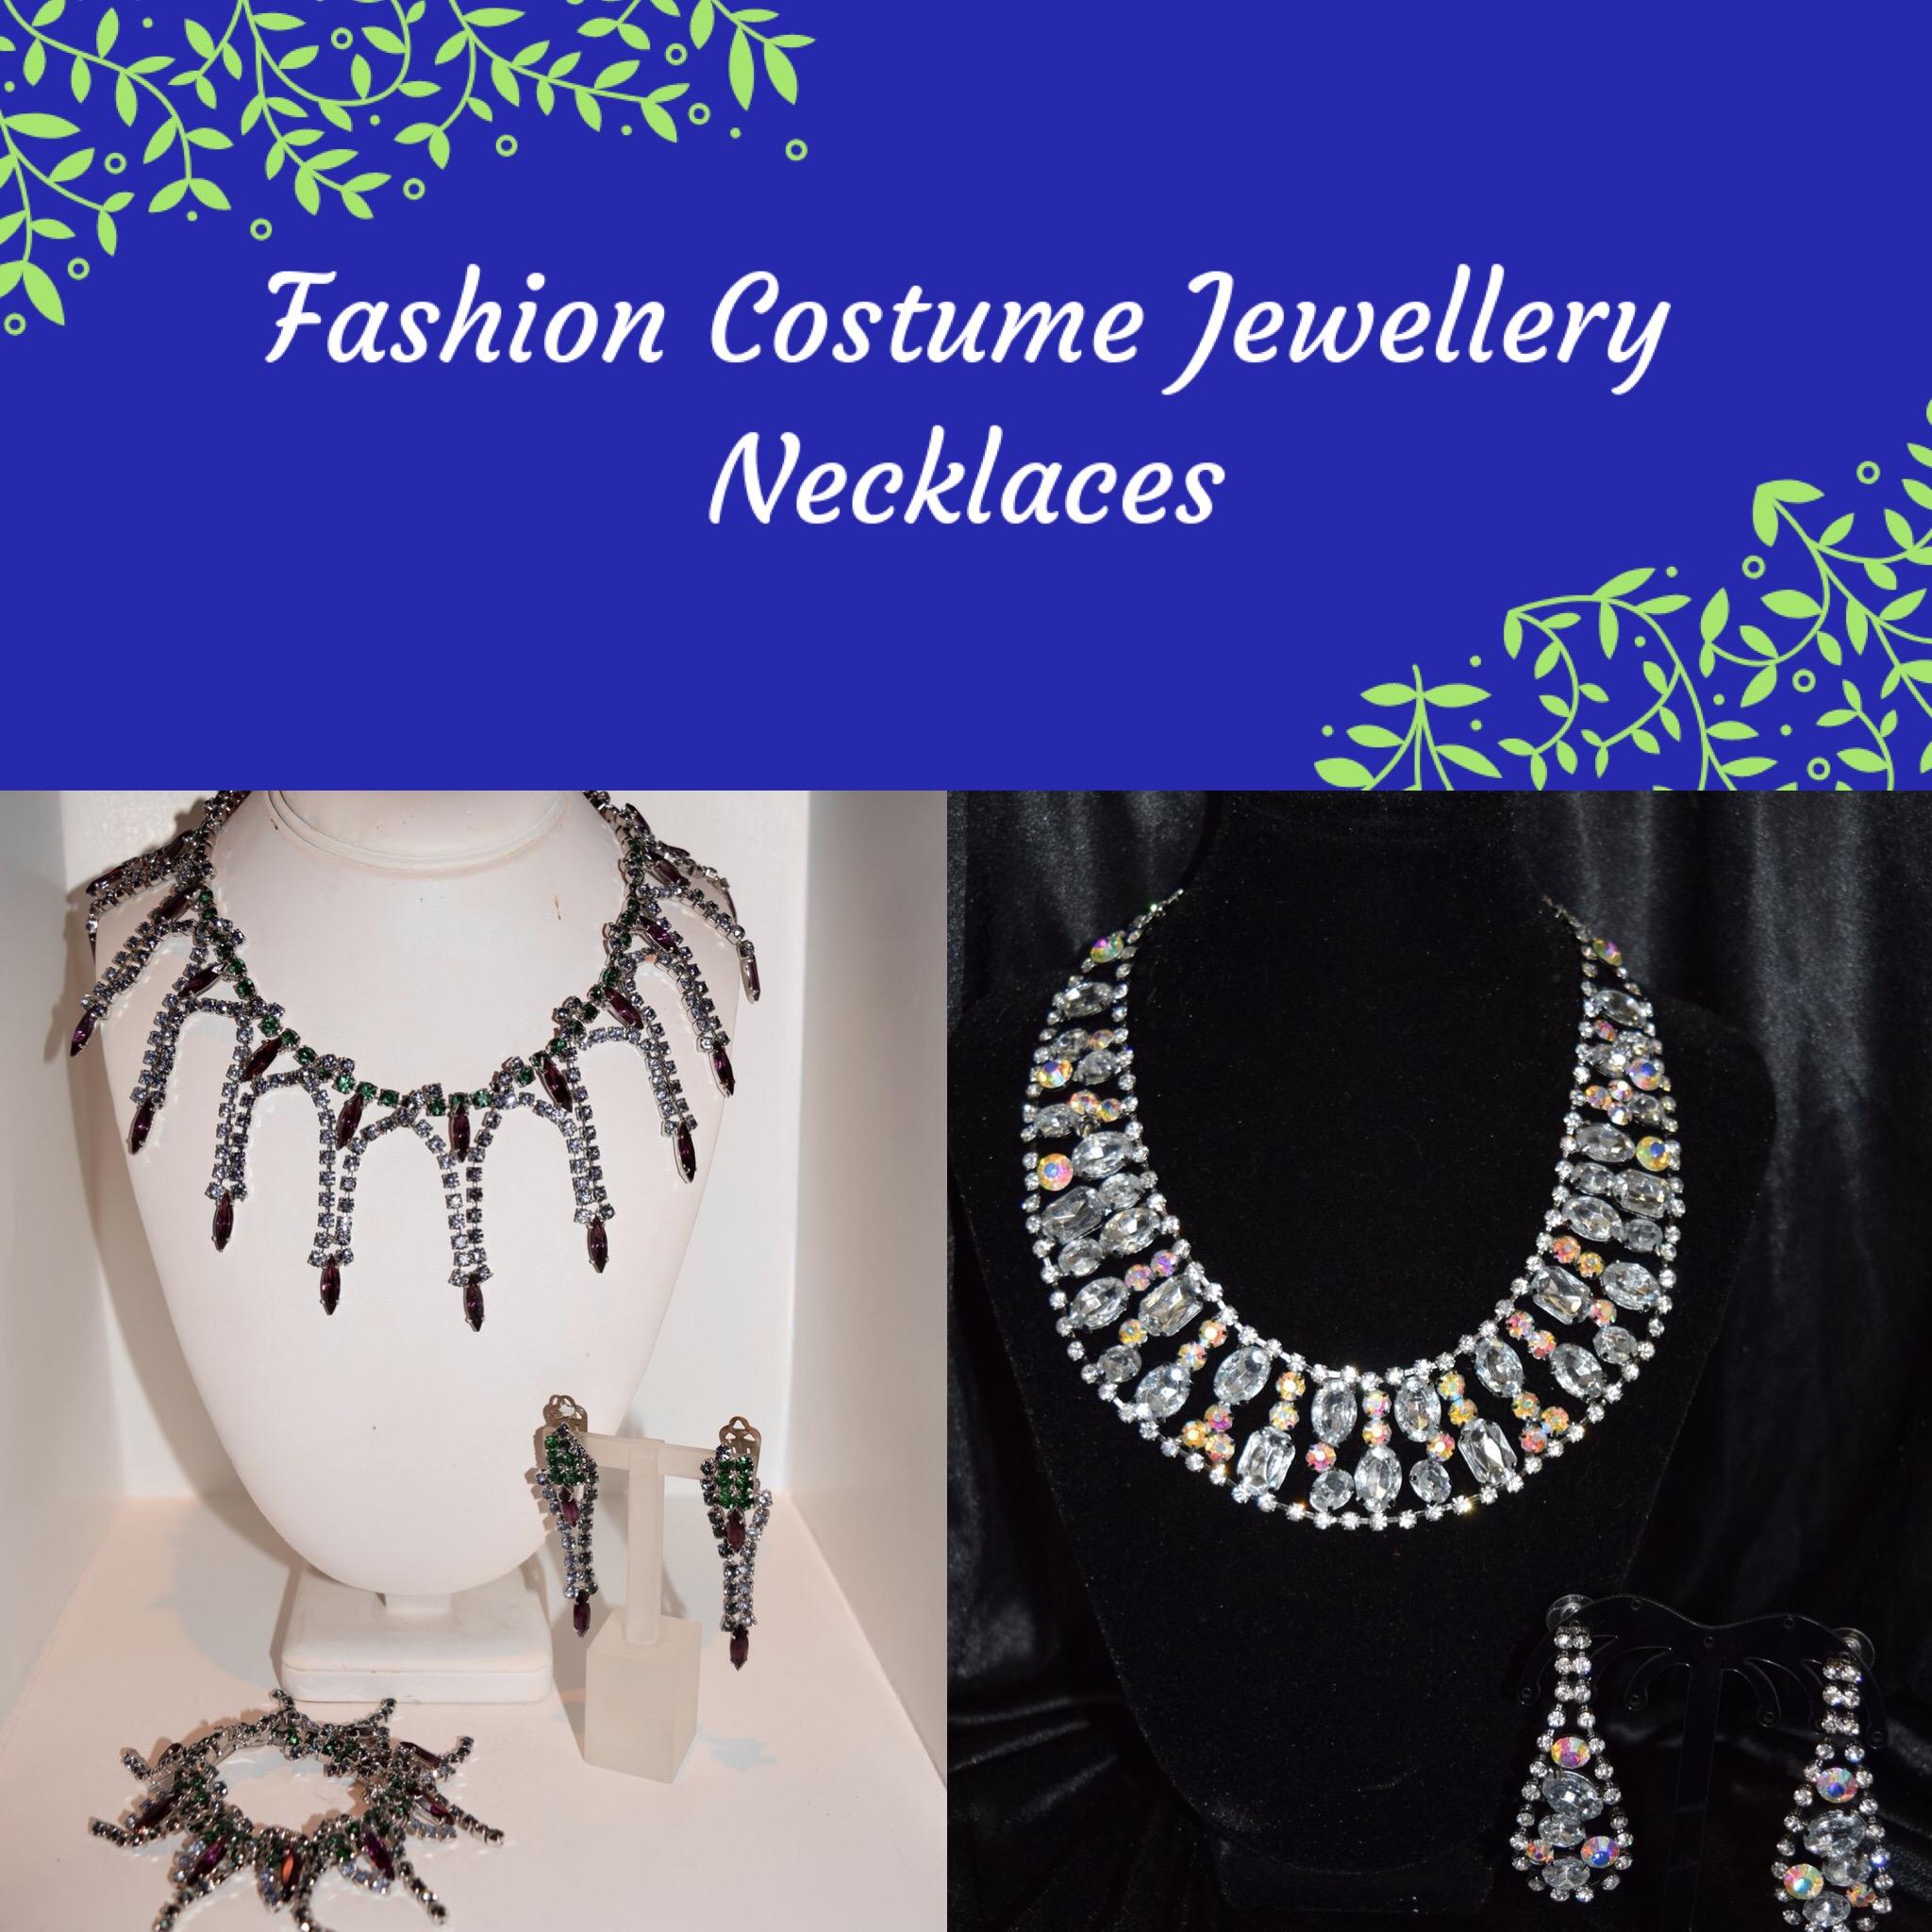 Fashion Costume Necklaces